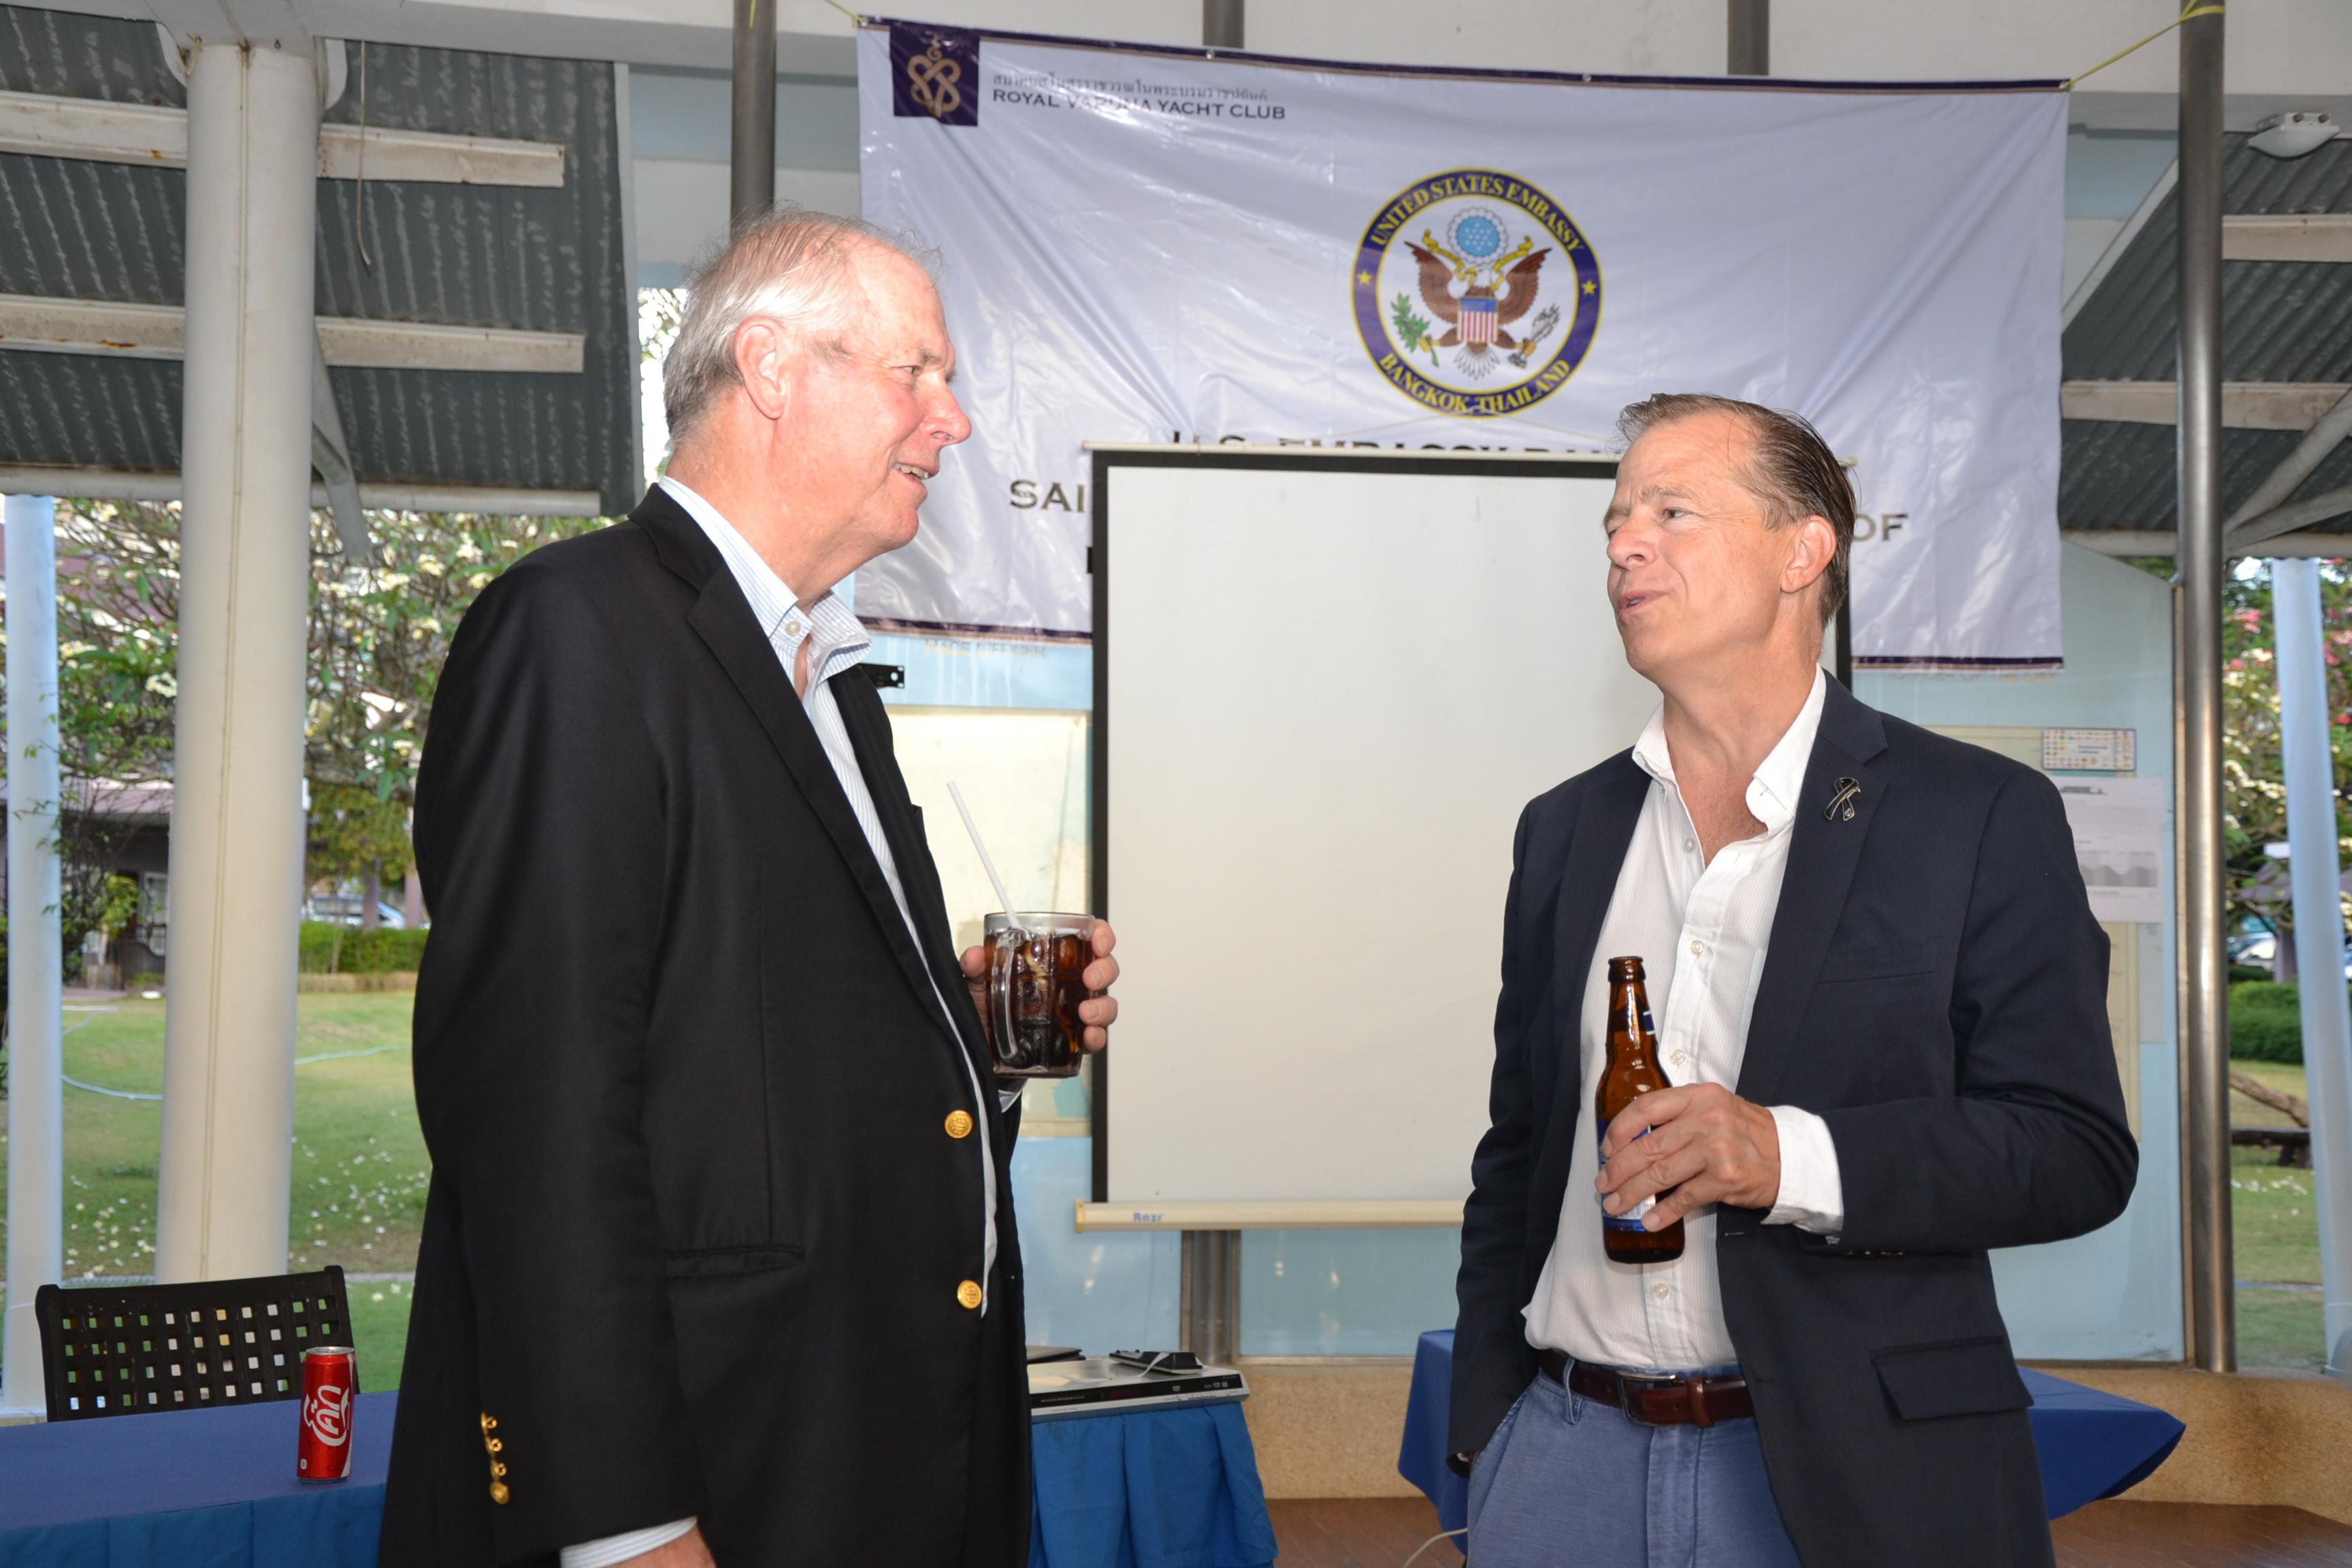 Gary Jobson and Ambassador Davies engage in light conversation.